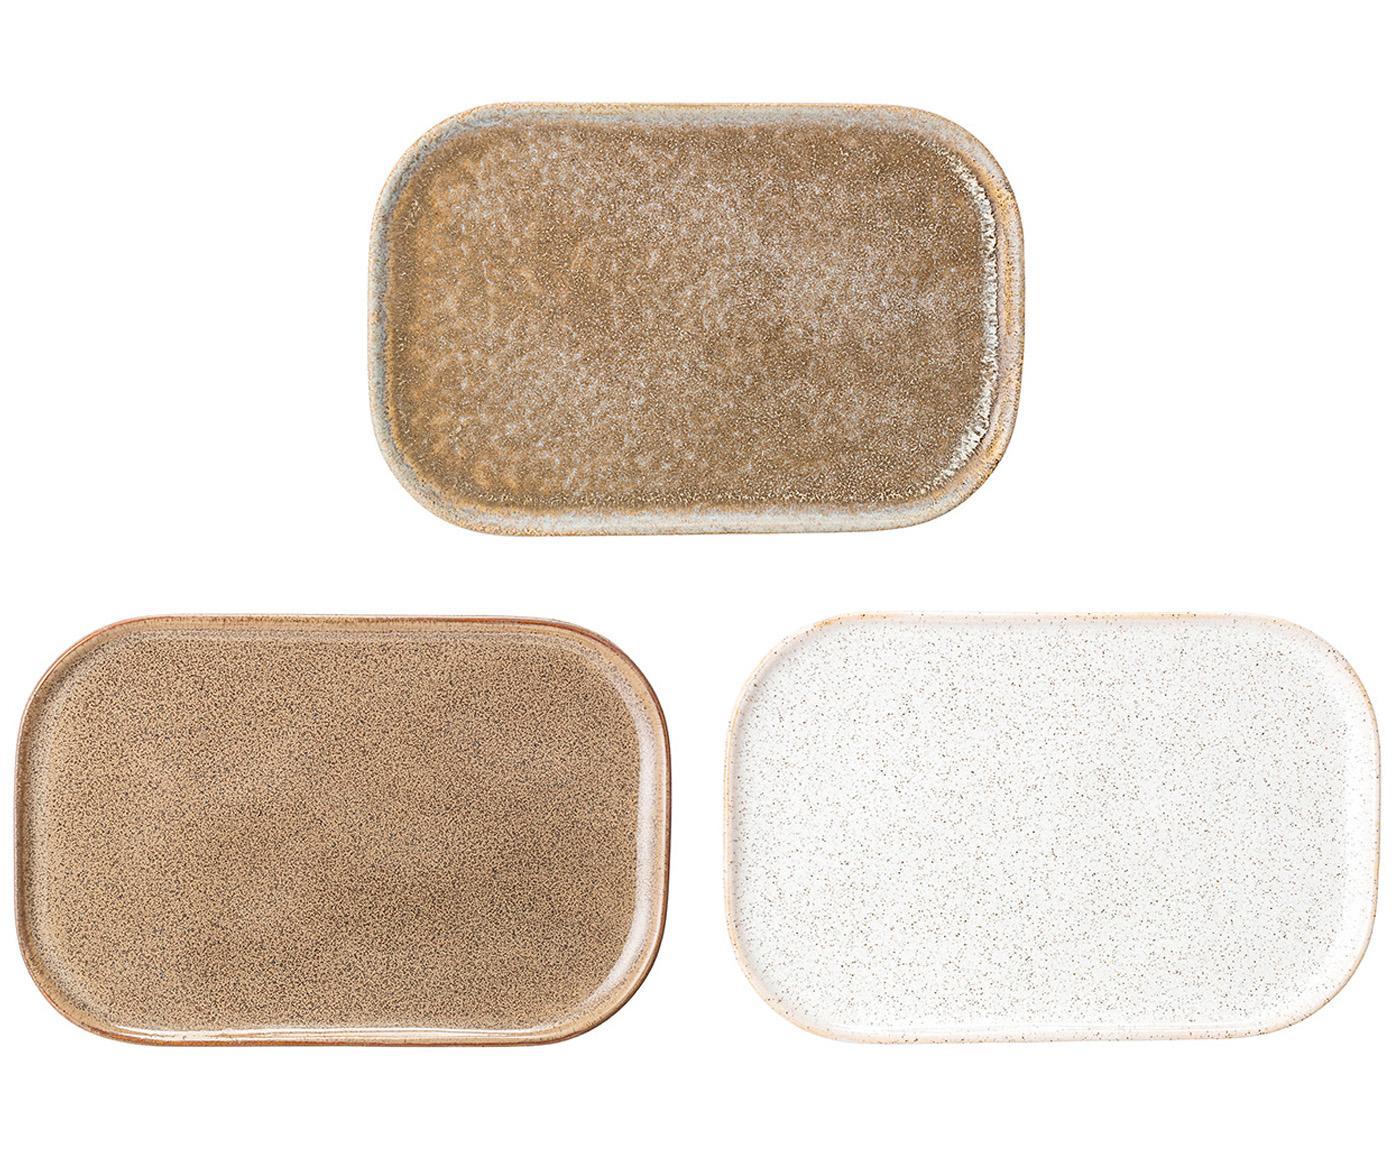 Set 3 piatti da portata fatti a mano Addison, Terracotta, Beige, bianco, Larg. 15 x Prof. 23 cm